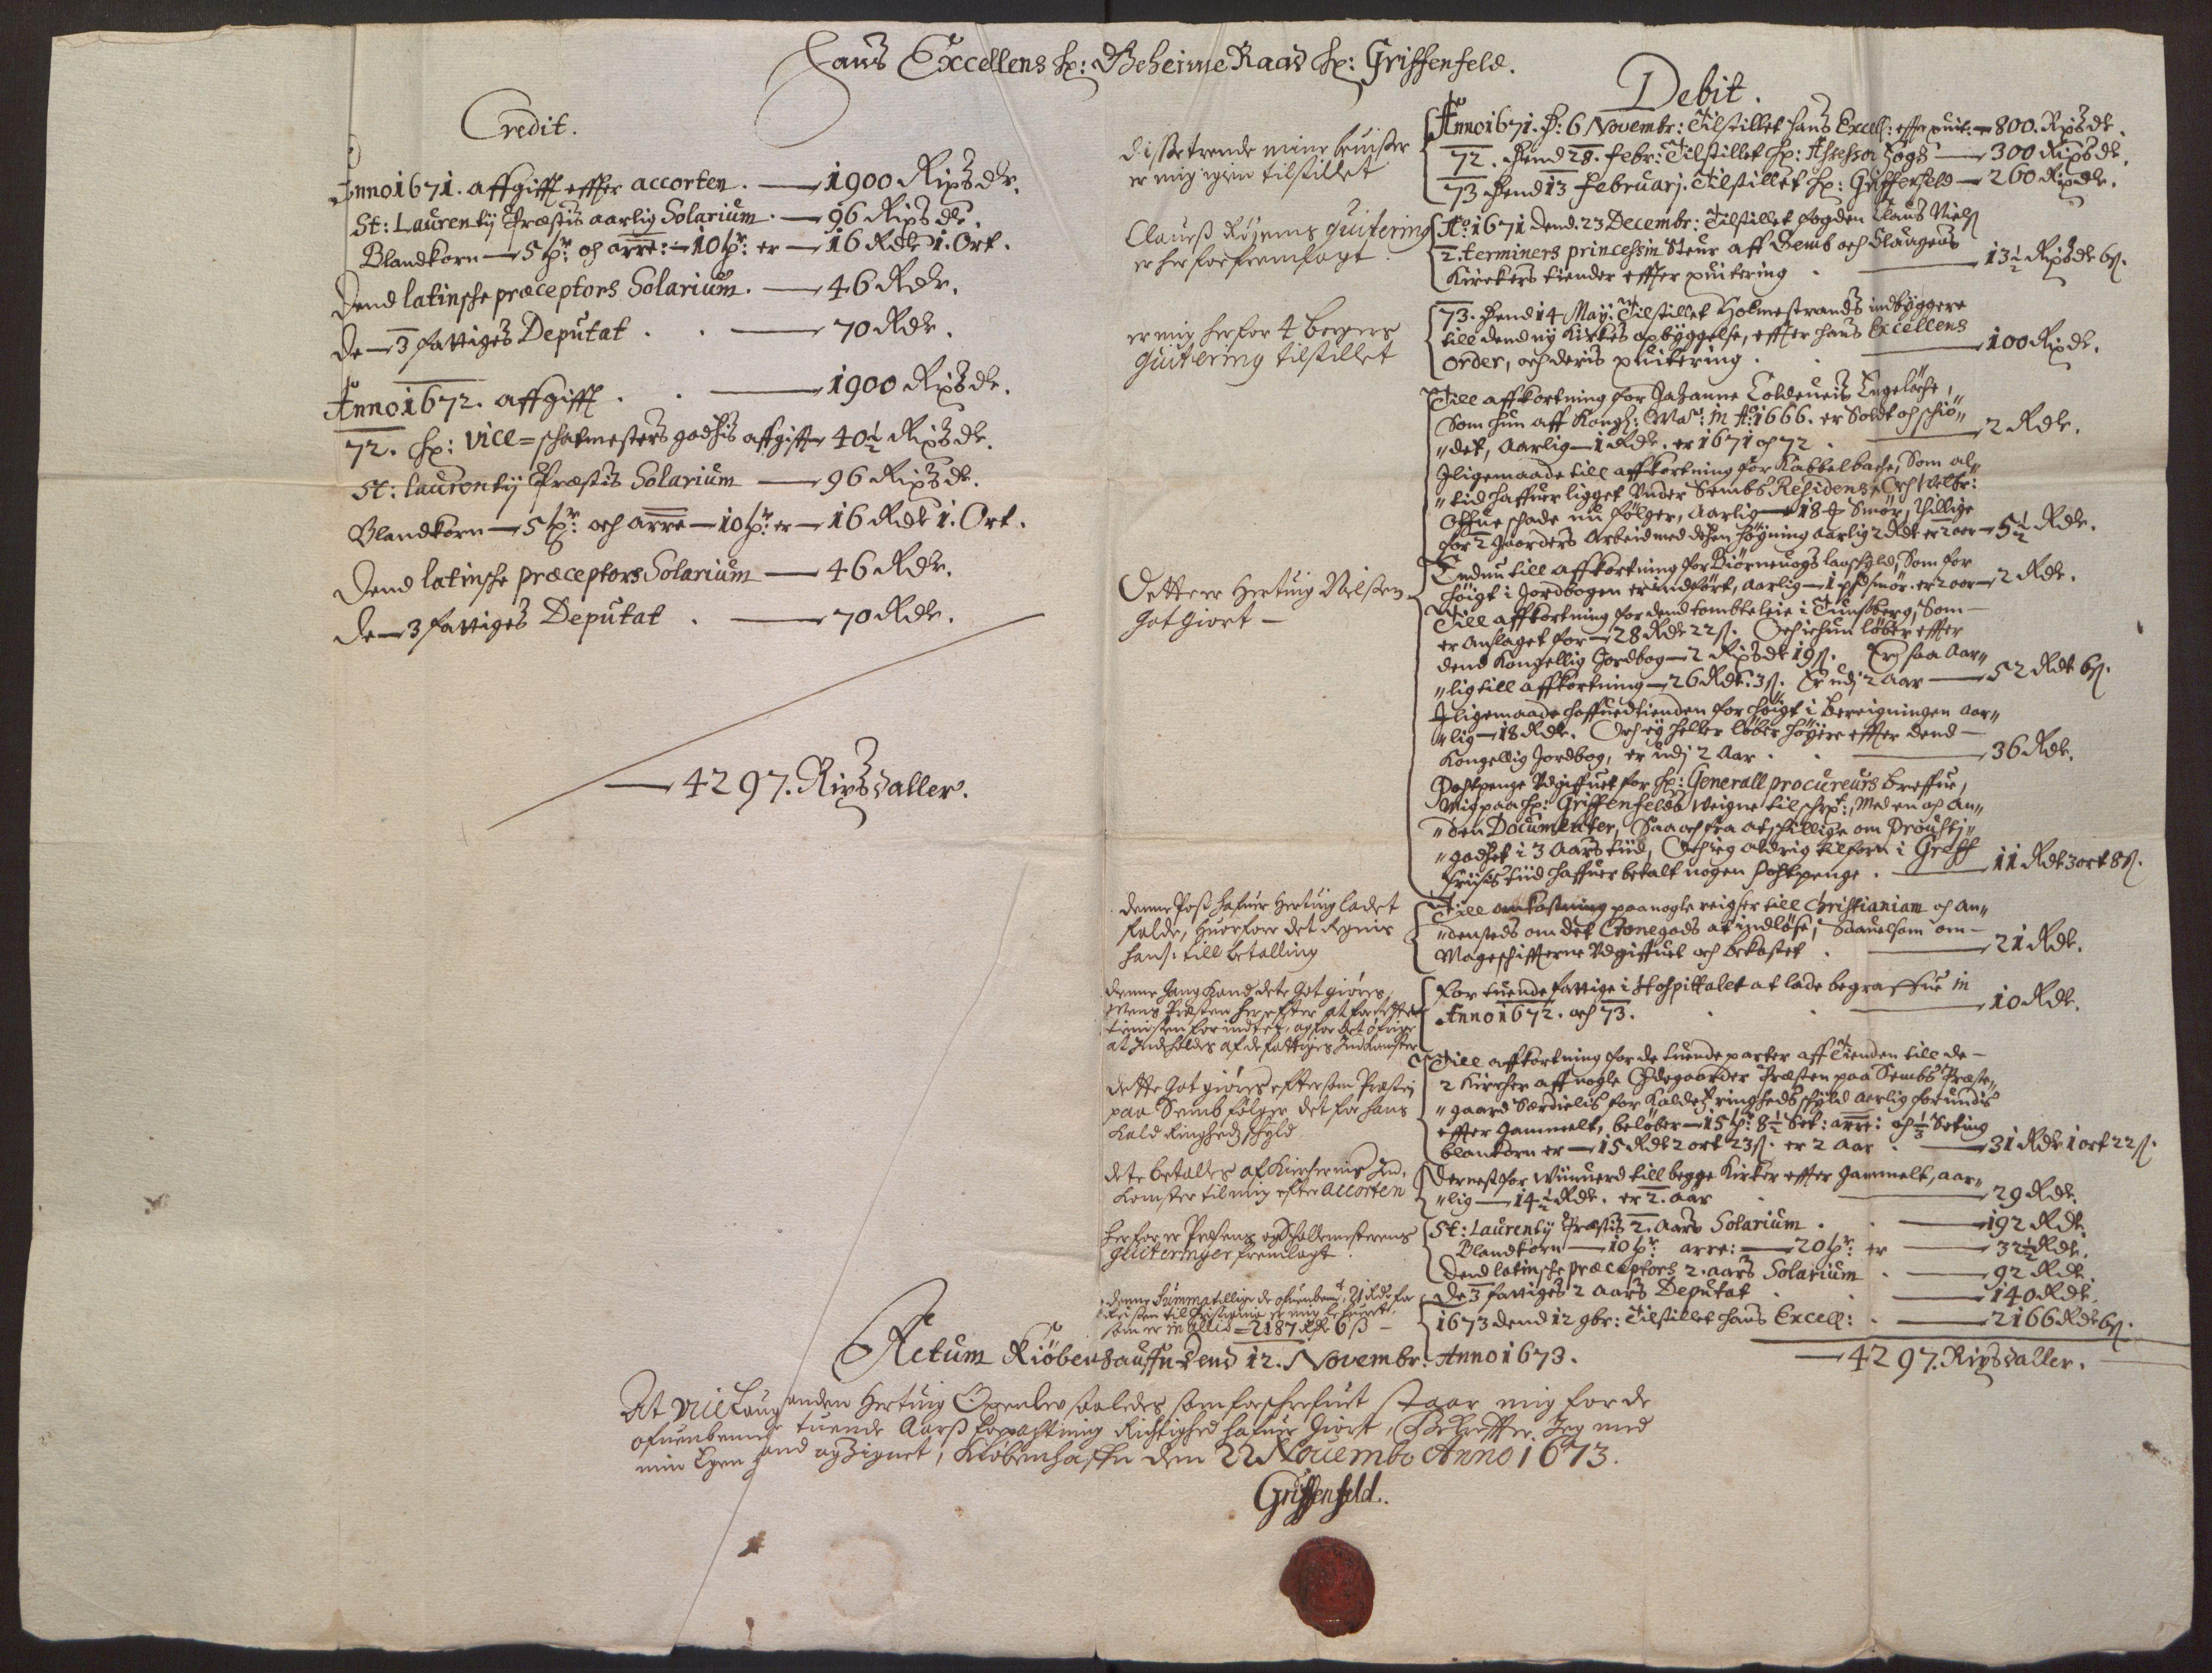 RA, Rentekammeret inntil 1814, Reviderte regnskaper, Fogderegnskap, R32/L1843: Fogderegnskap Jarlsberg grevskap, 1674-1675, s. 36